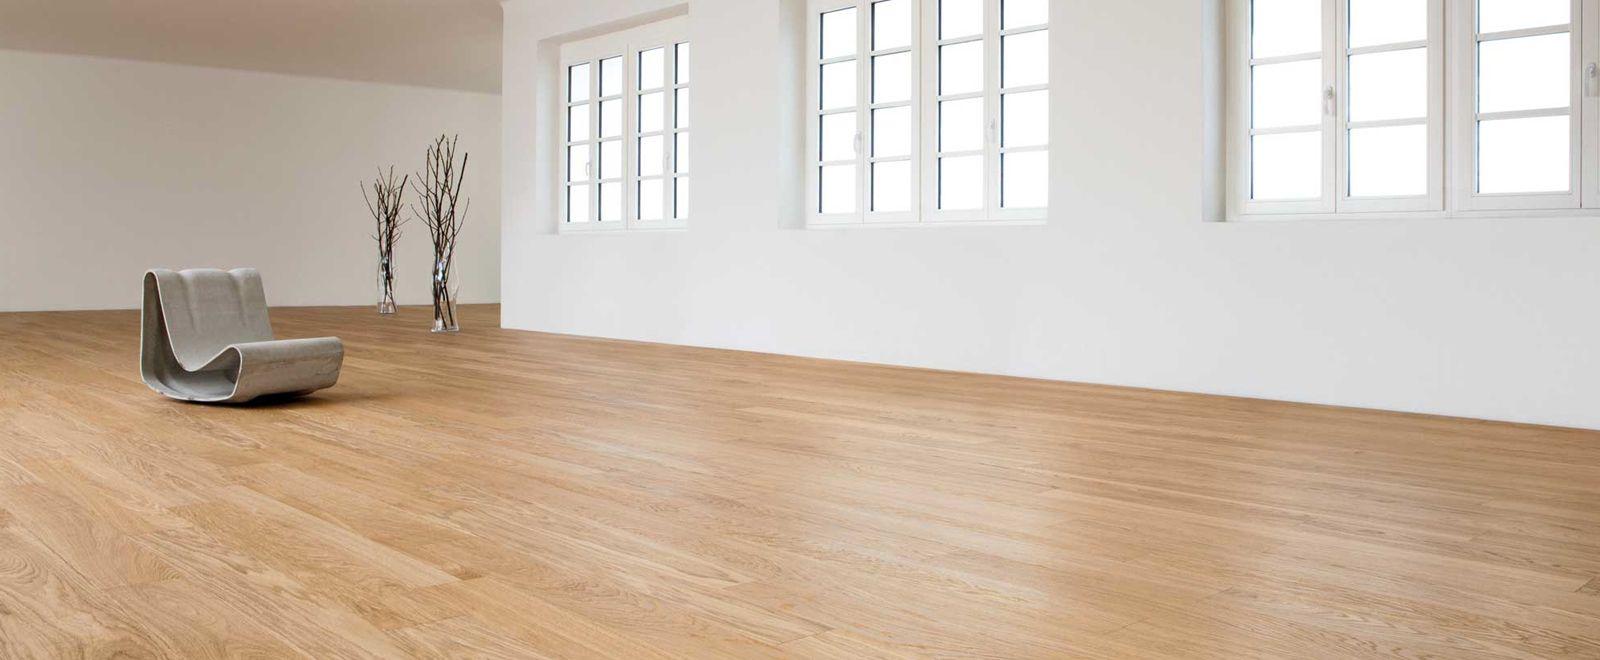 Pisos simil madera de vinilo ideas de inspiraci n - Colocar piso vinilico ...